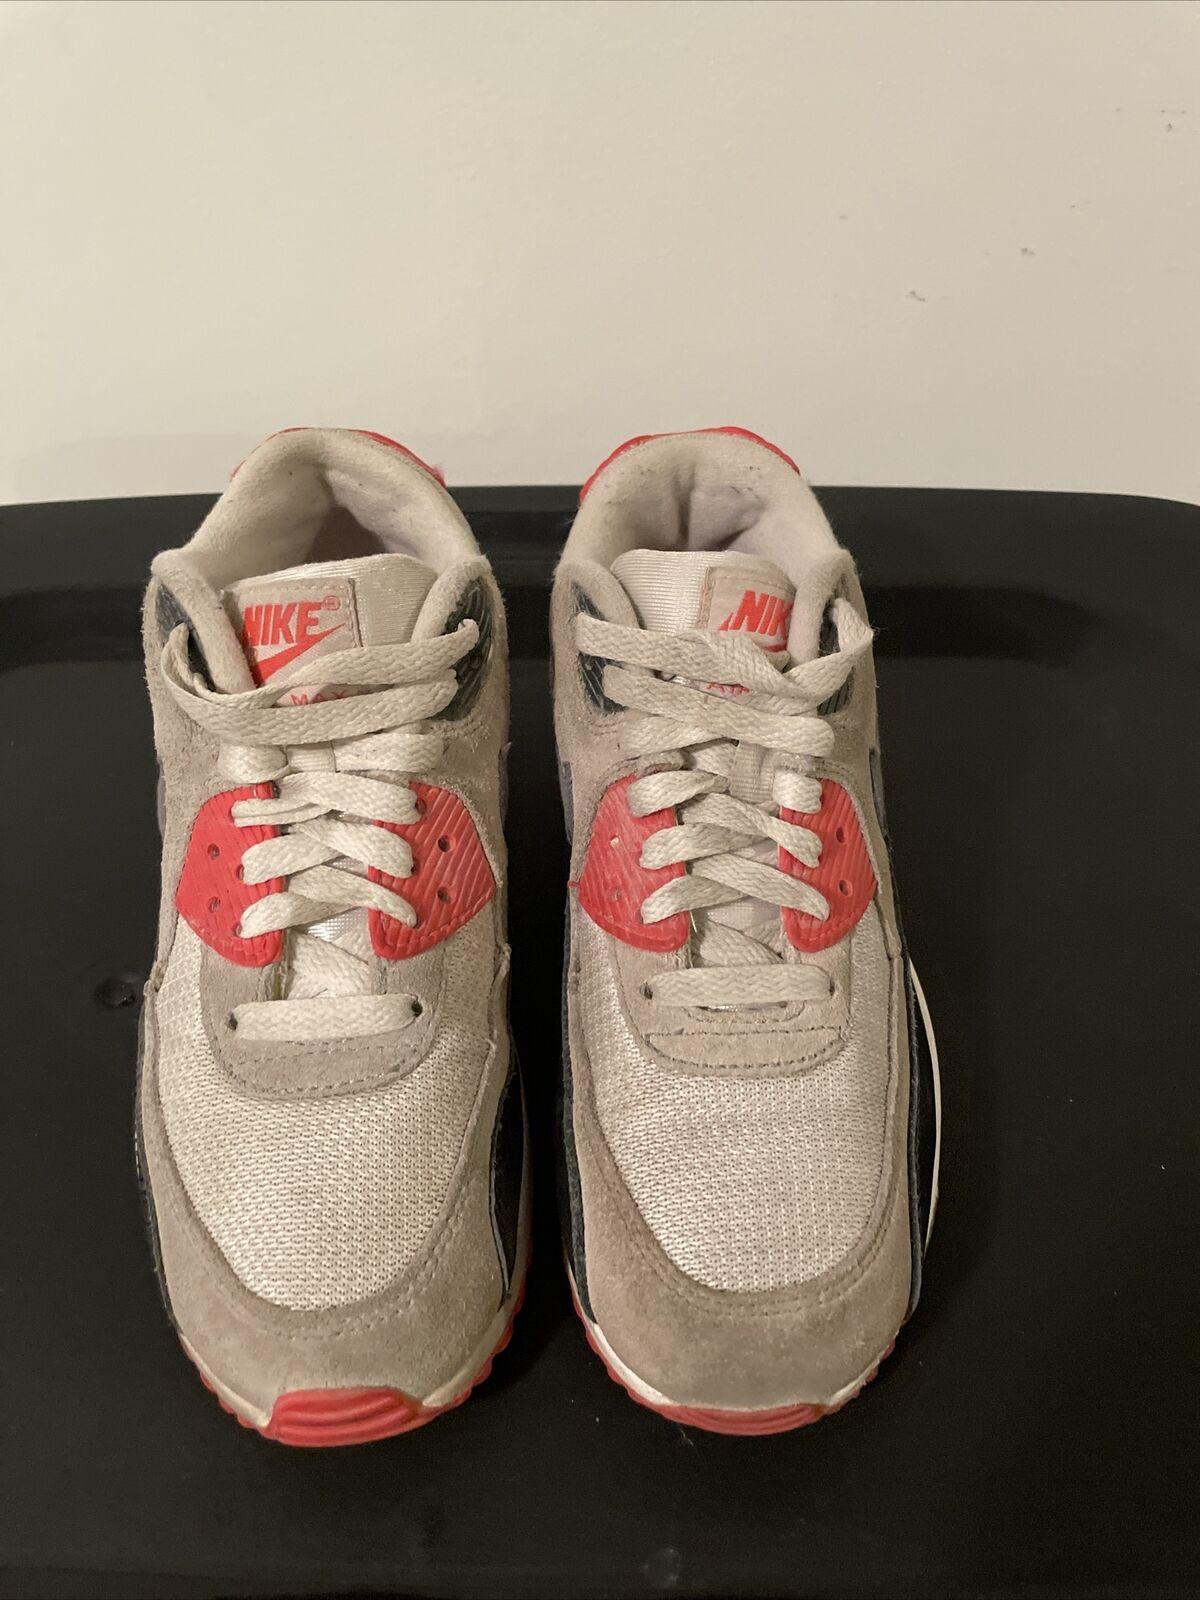 Nike Air Max 90 Premium Mesh GS Youth Shoe Size 6y 724882-100 ...